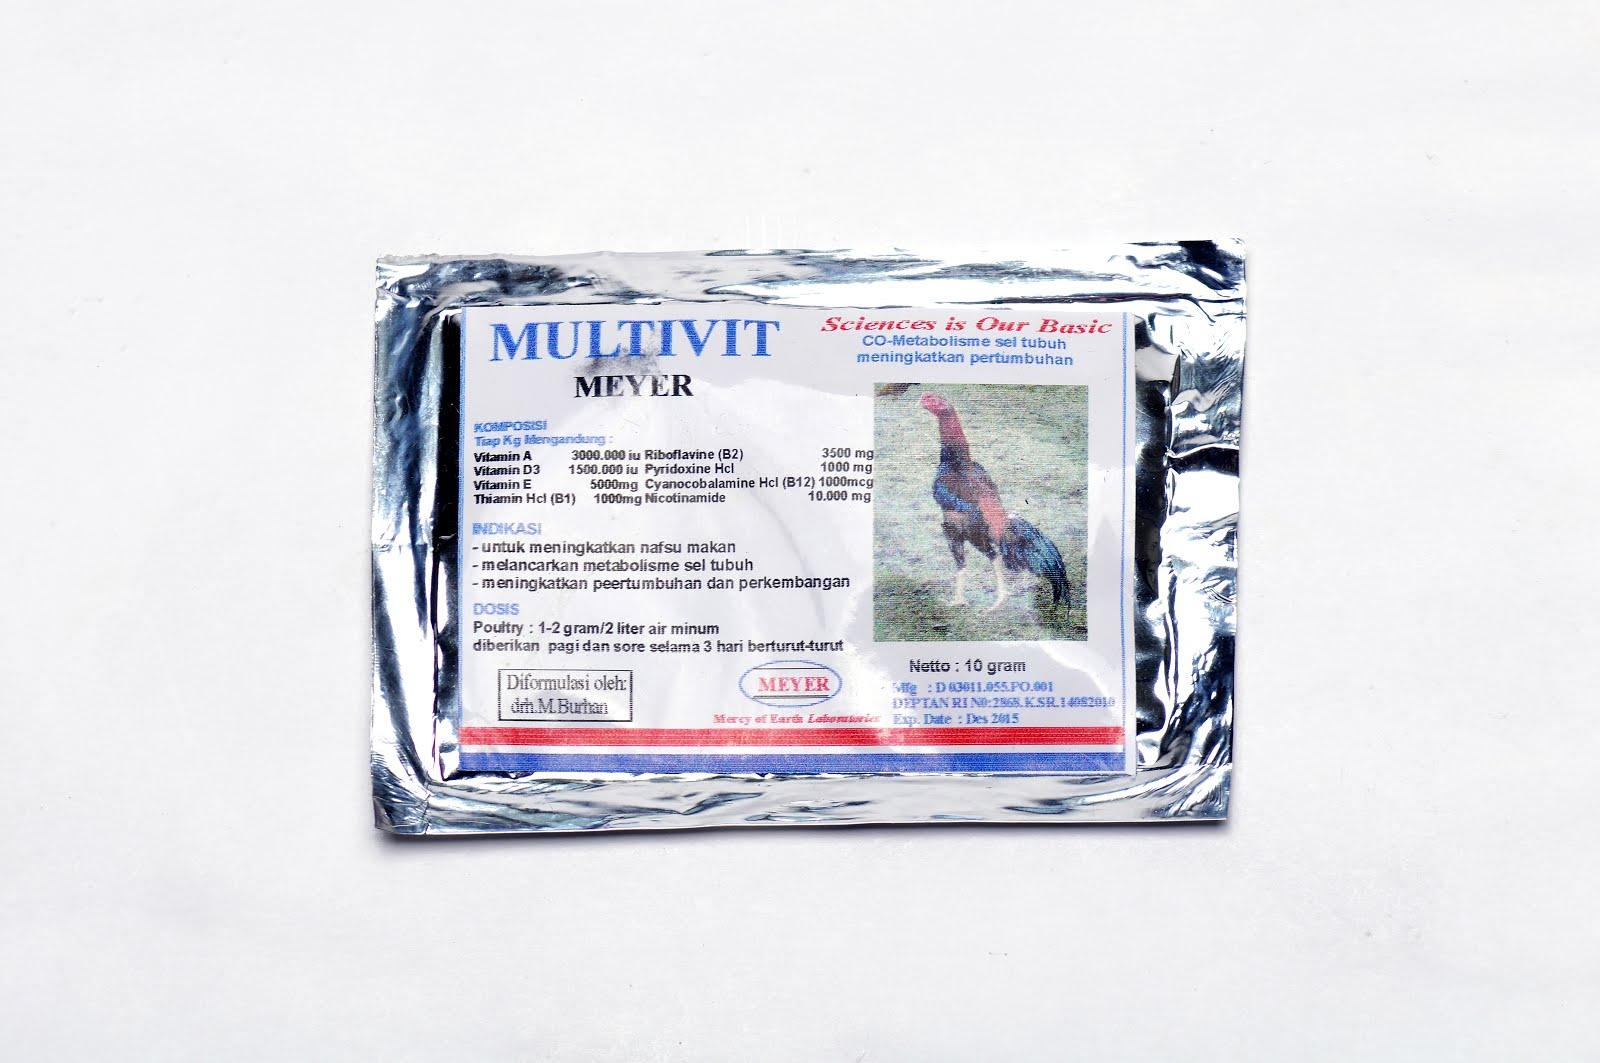 Multivit Meyer (untuk Unggas)